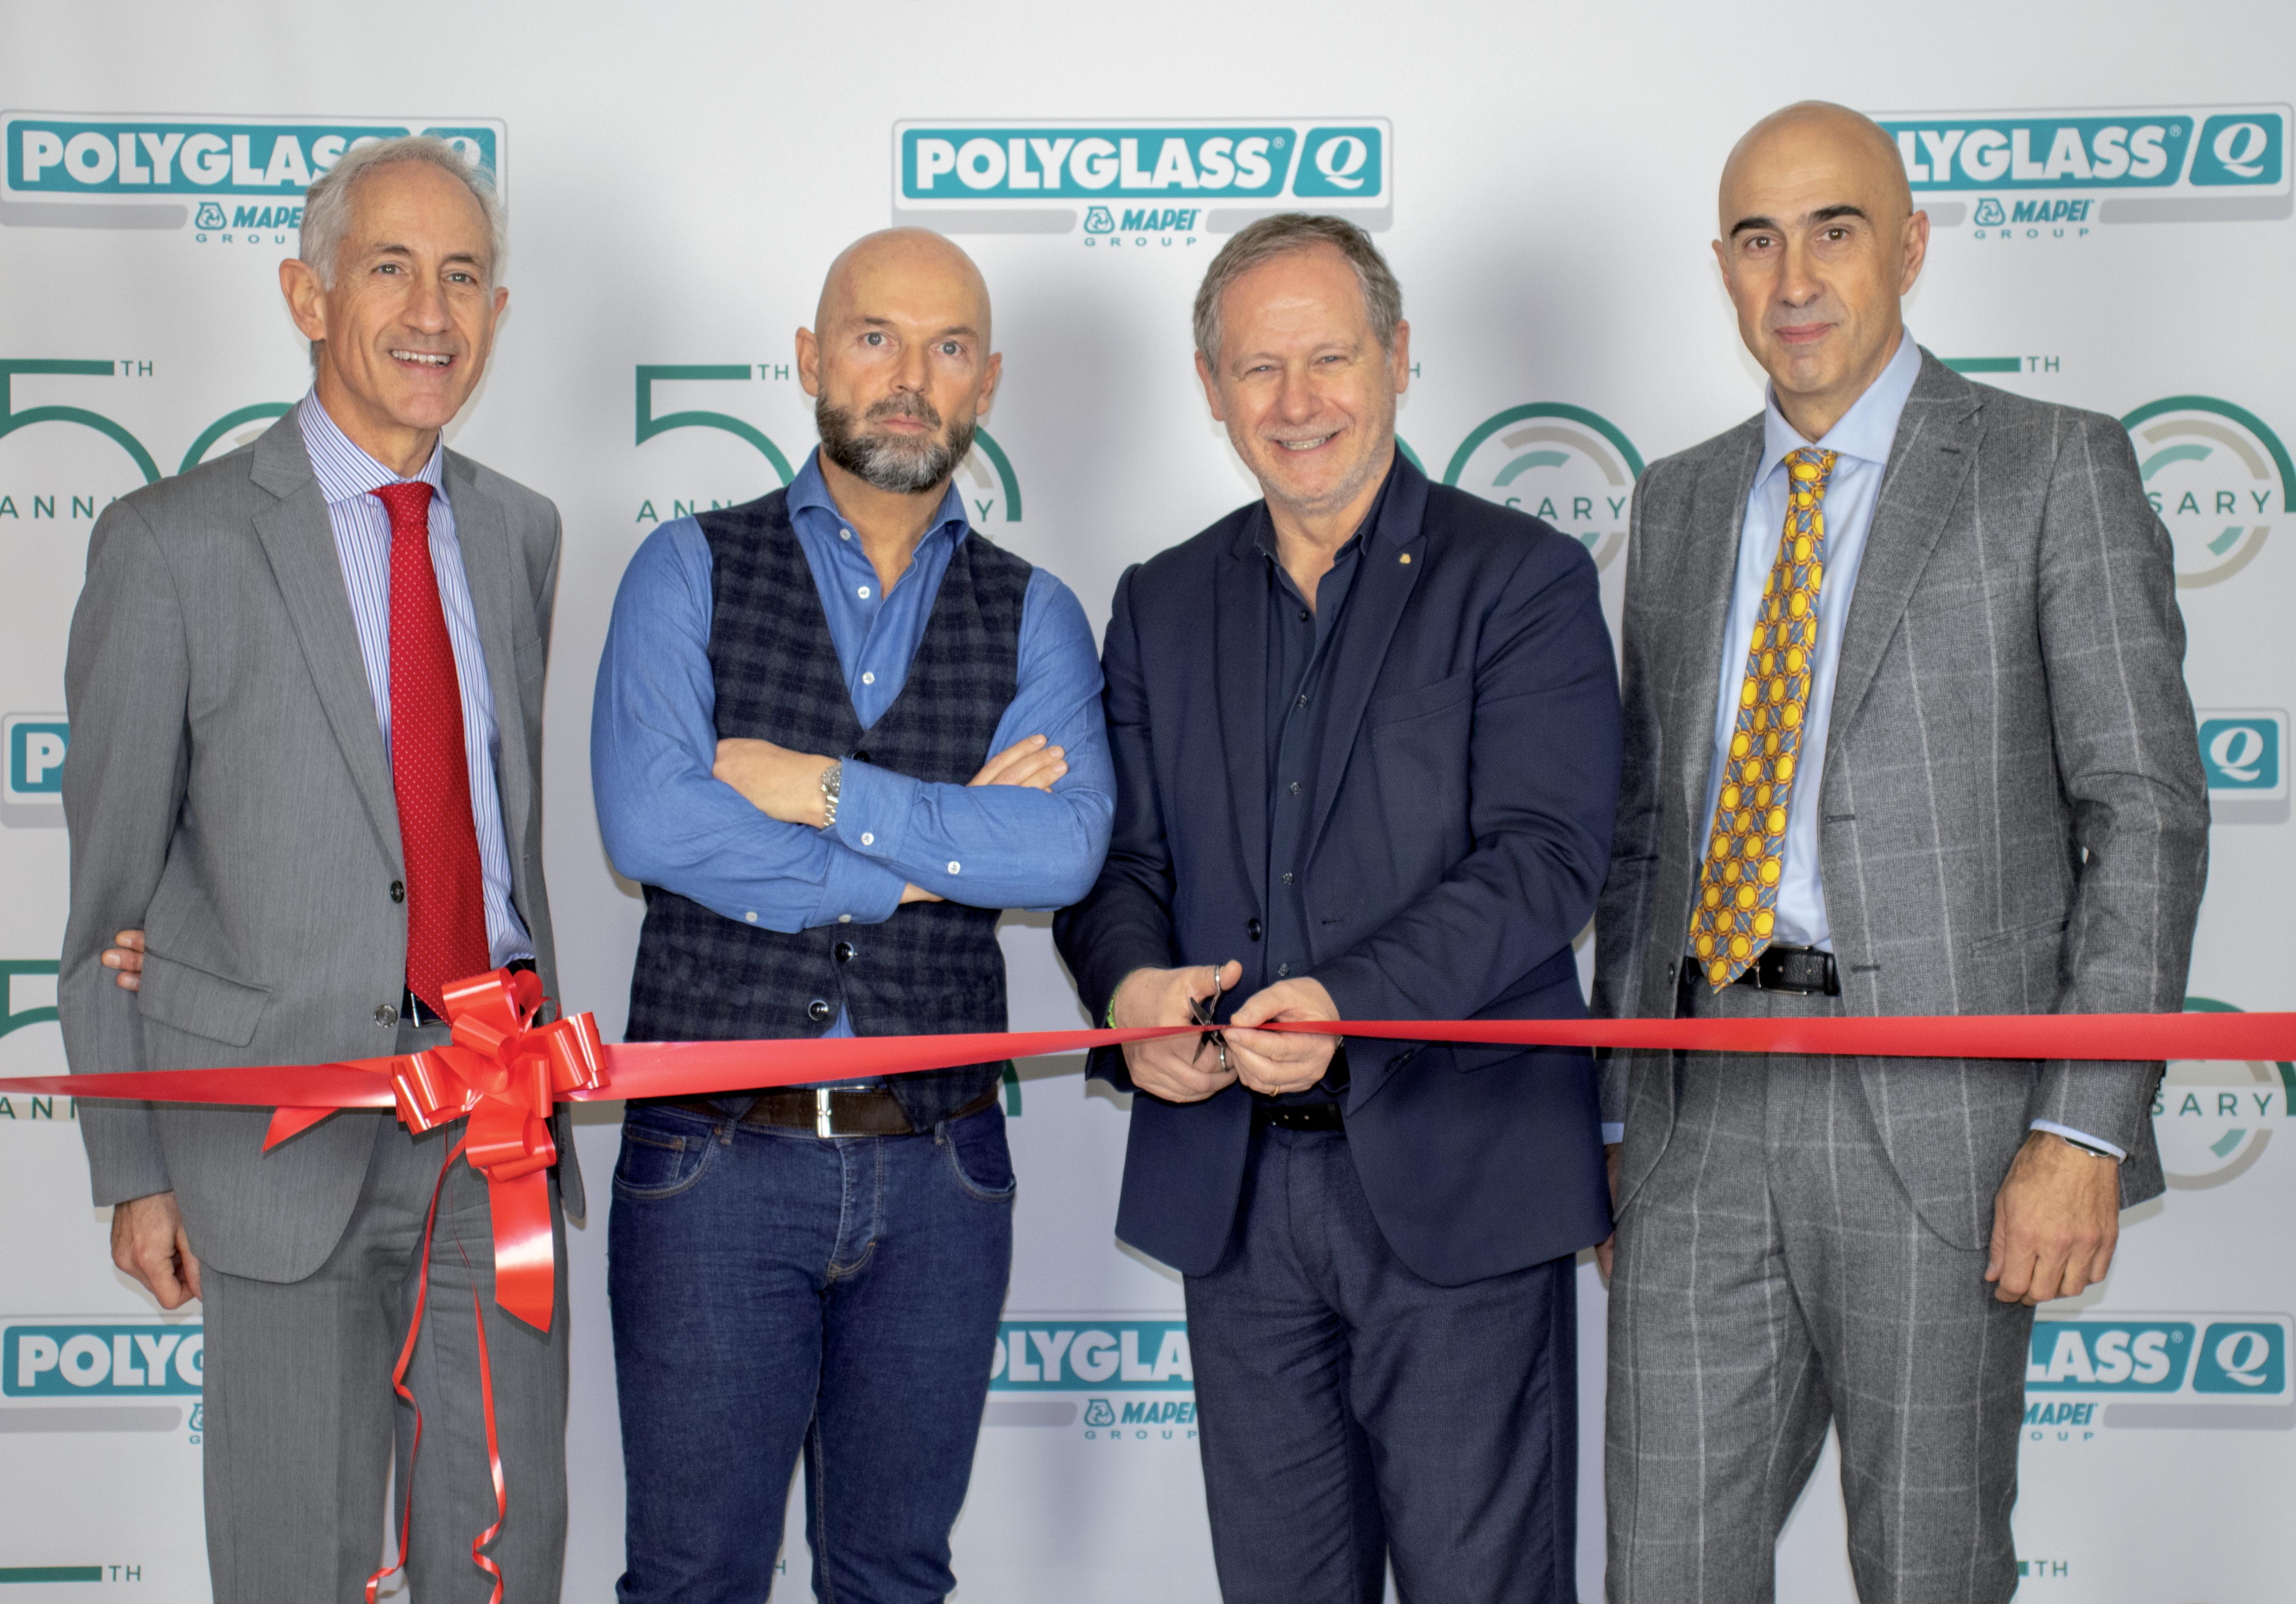 Polyglass festeggia 50 anni - shutterstock_1390792451.jpg